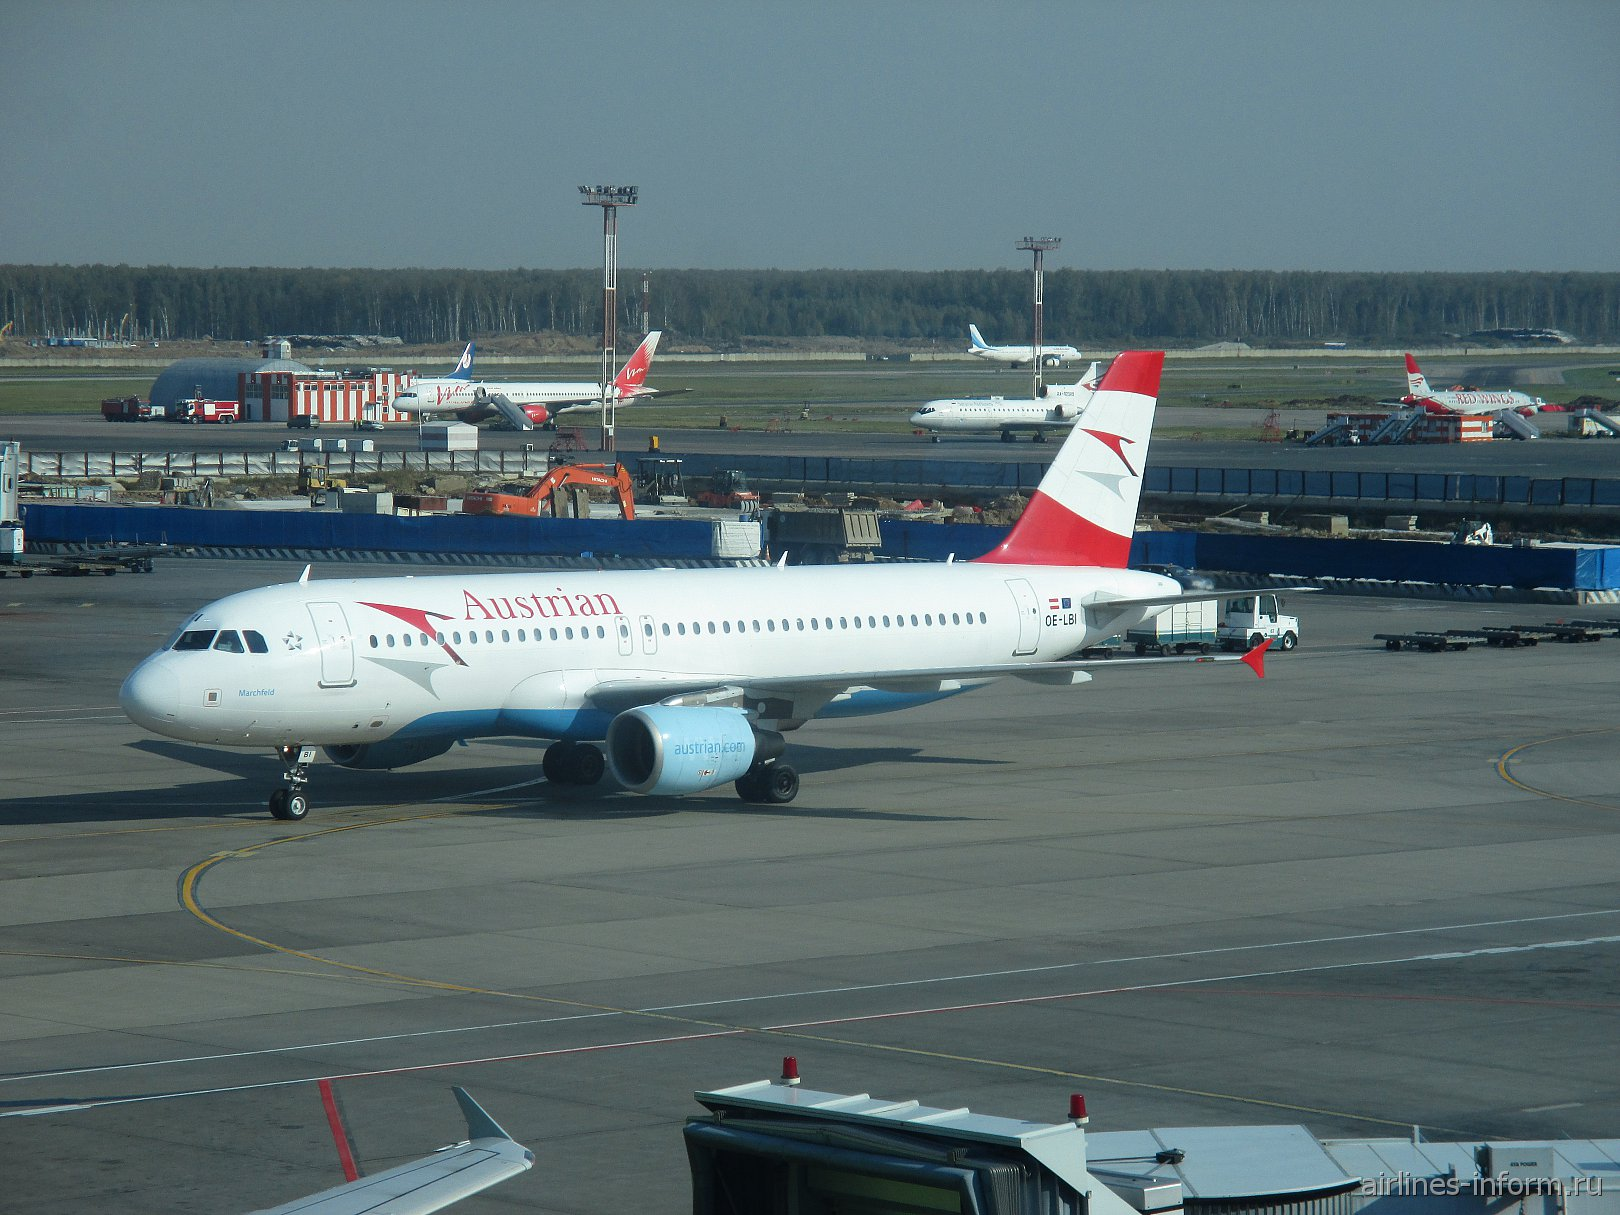 Airbus A320 Австрийских авиалиний в аэропорту Москва Домодедово